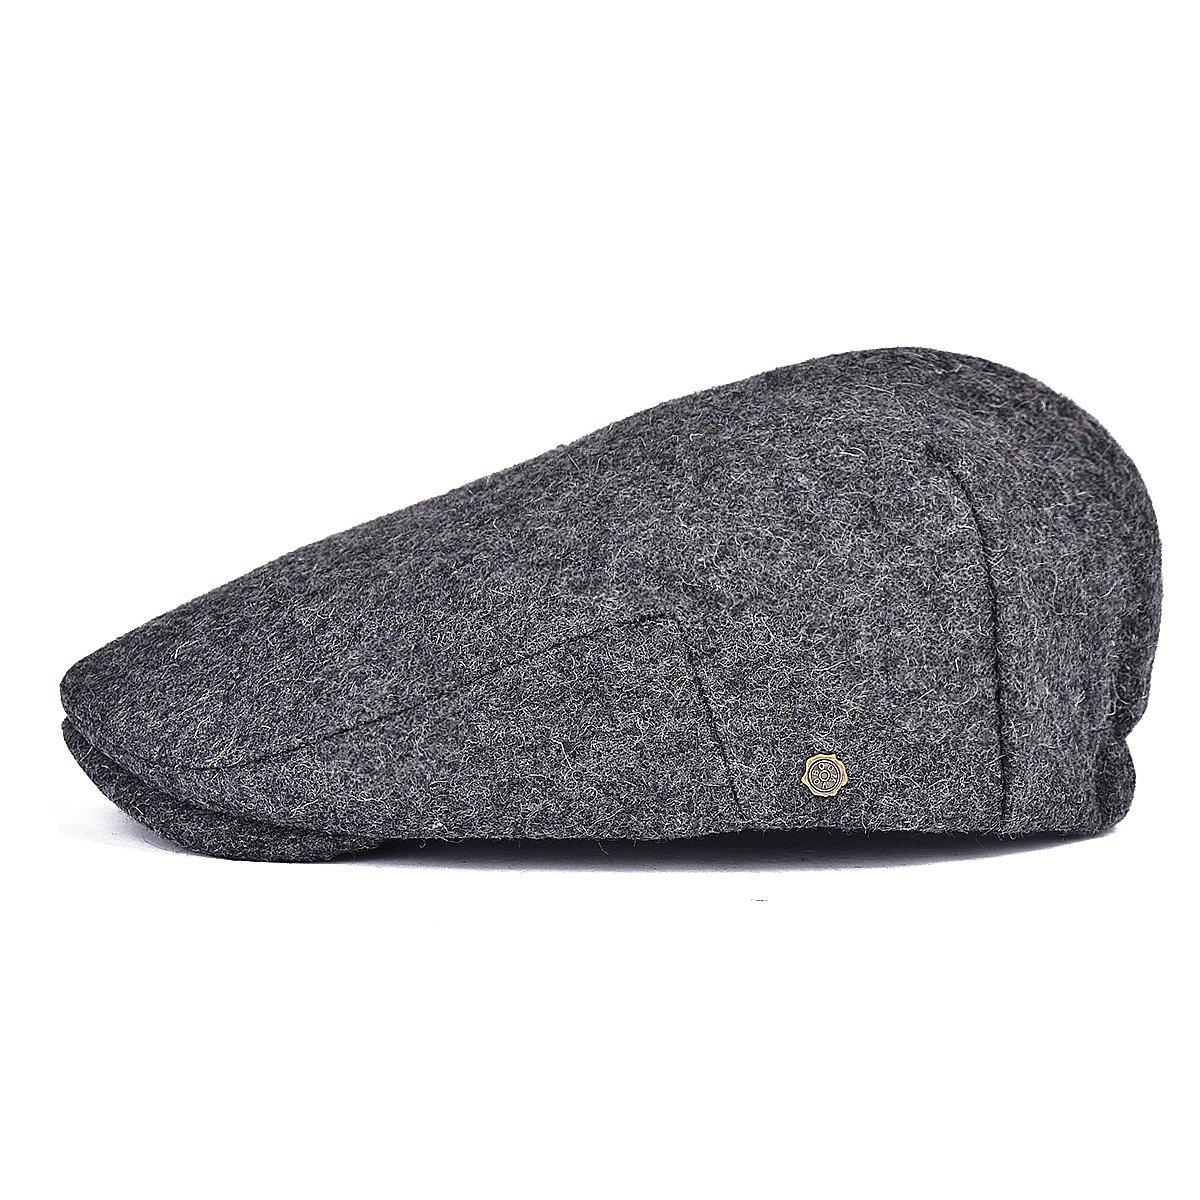 VOBOOM Mens Winter Wool Irish Tweed Caps Newsboy Flat Cap Back Adjustable Stretch fit